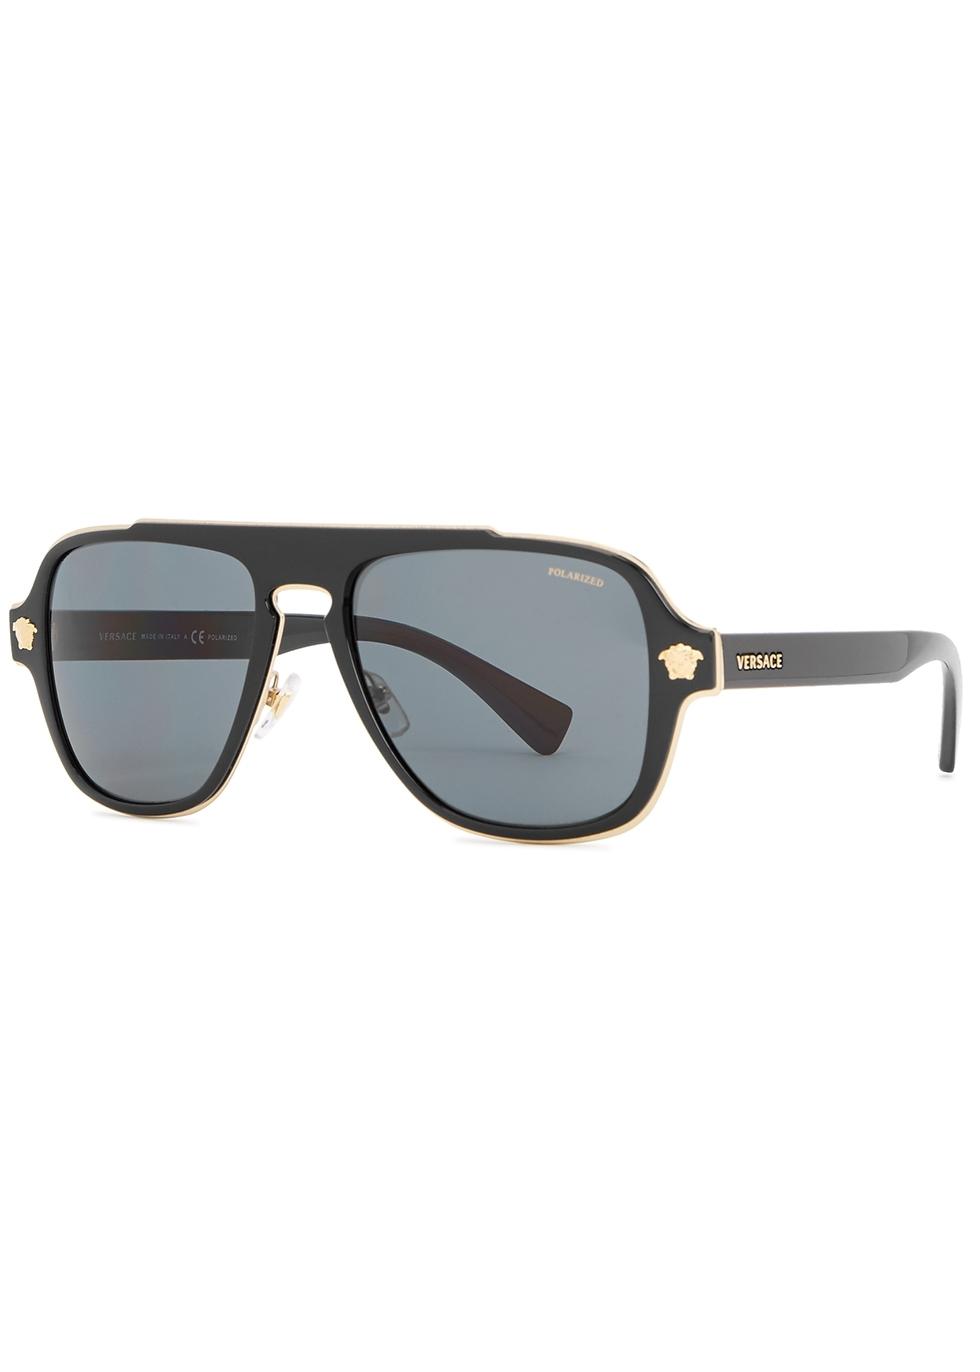 2efe66434c1 Women s Designer Sunglasses and Eyewear - Harvey Nichols